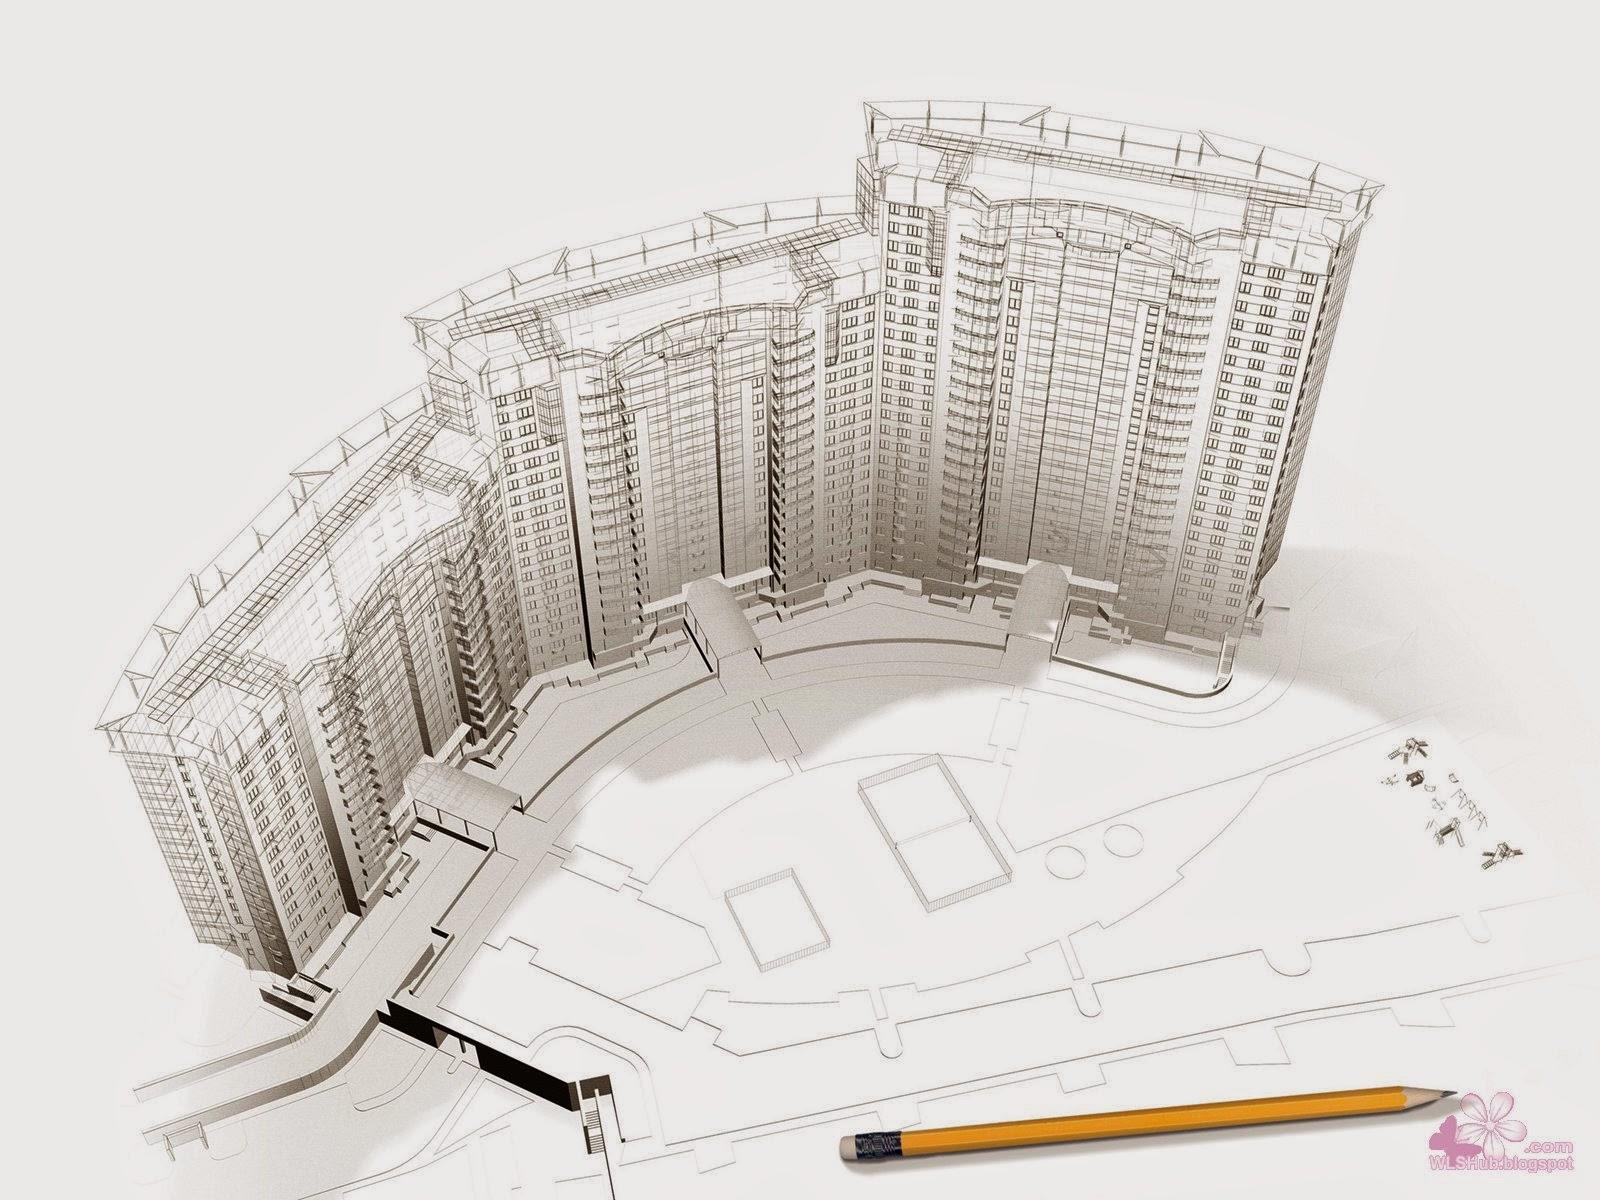 Fall 2018 Featured Design & Architecture